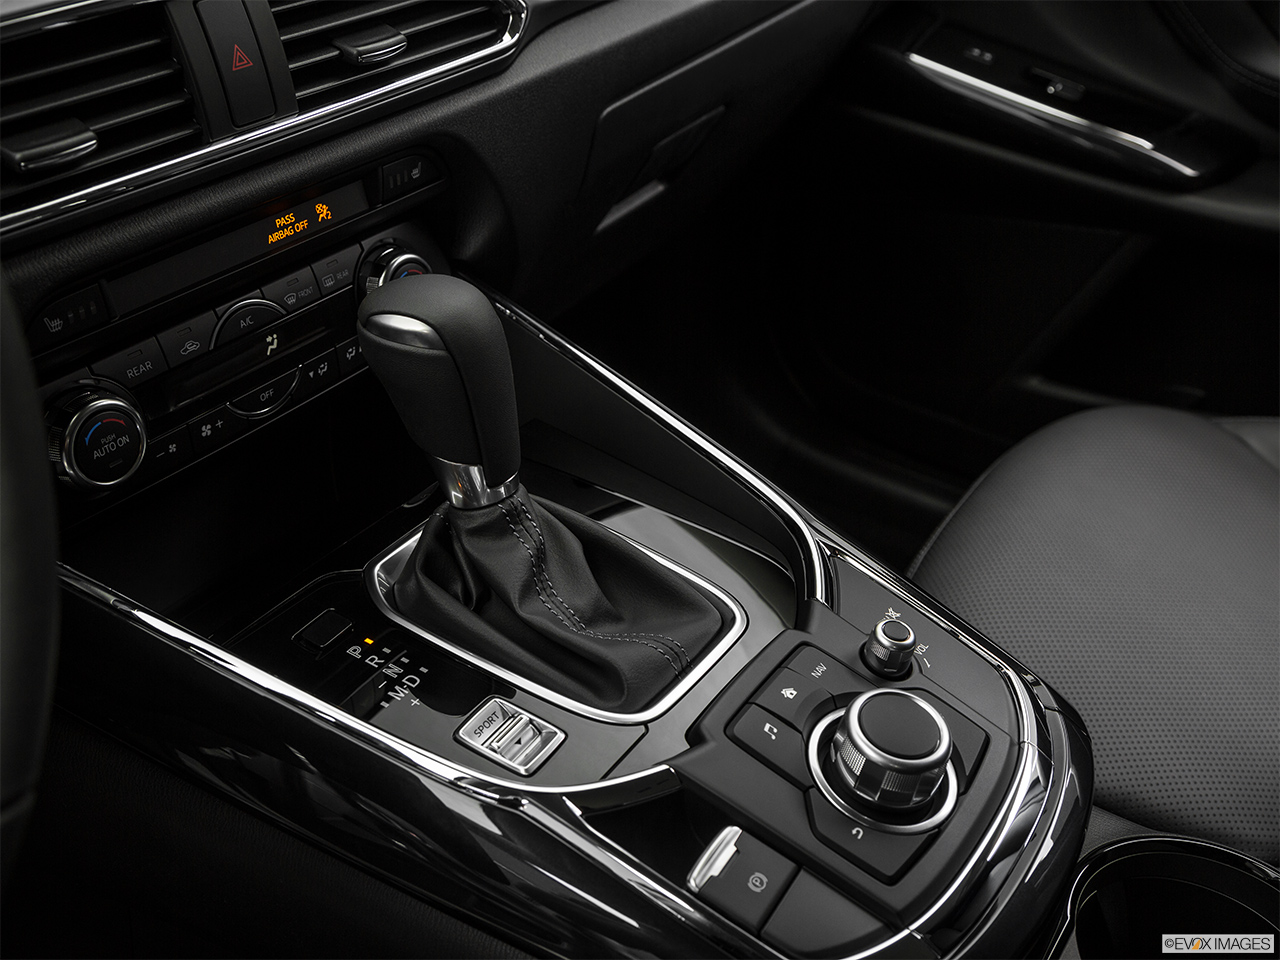 Mazda CX-9 2018, Saudi Arabia, Gear shifter/center console.